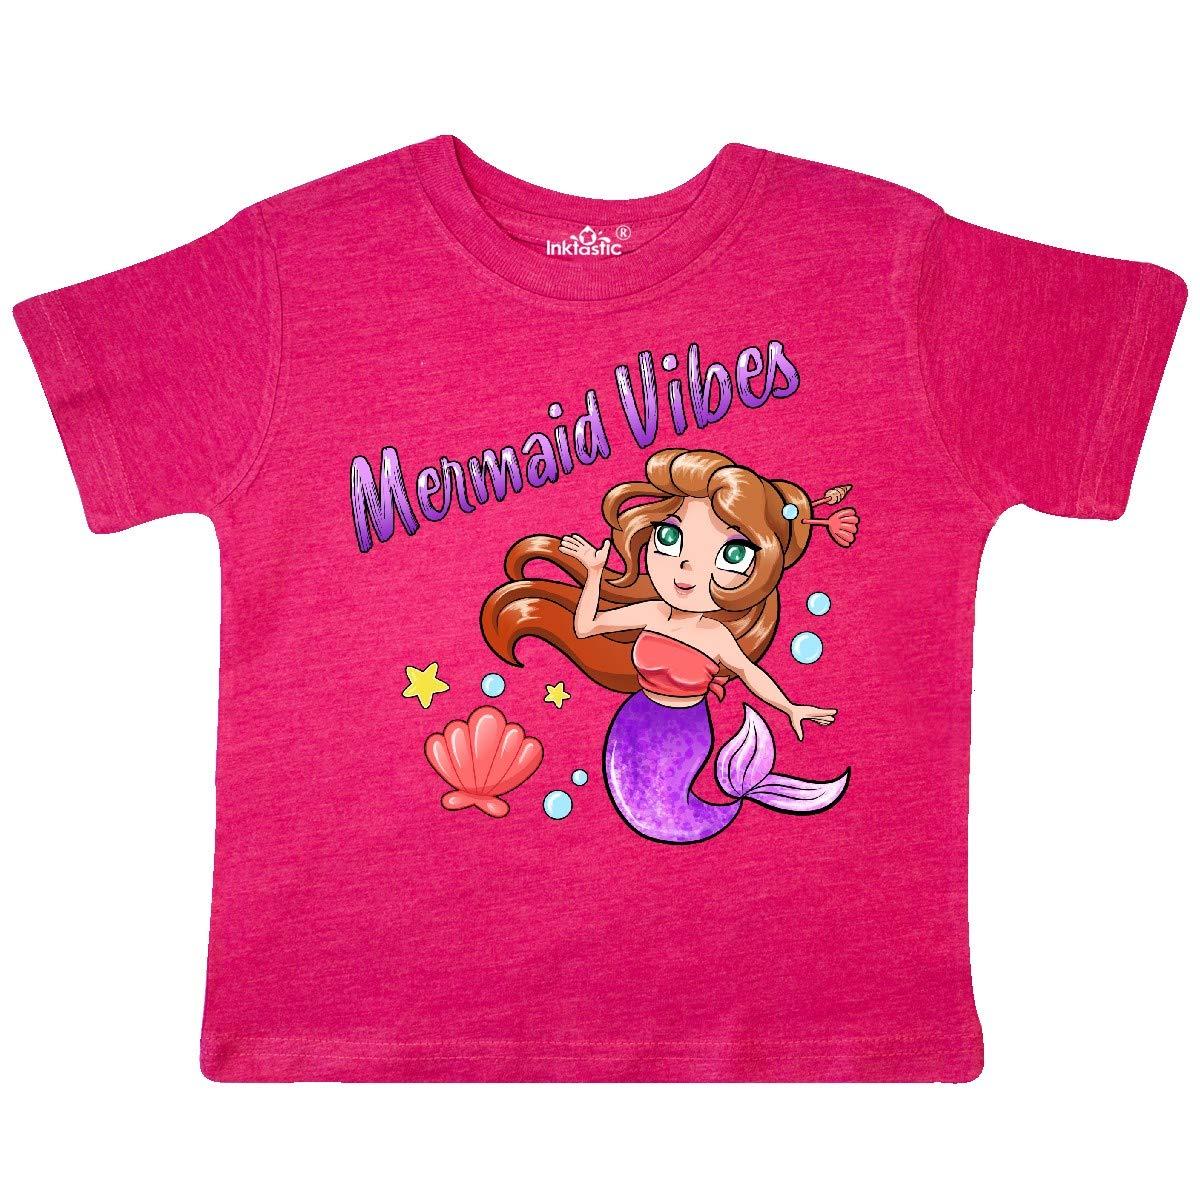 Cute Mermaid with Purple Tail Toddler T-Shirt inktastic Mermaid Vibes